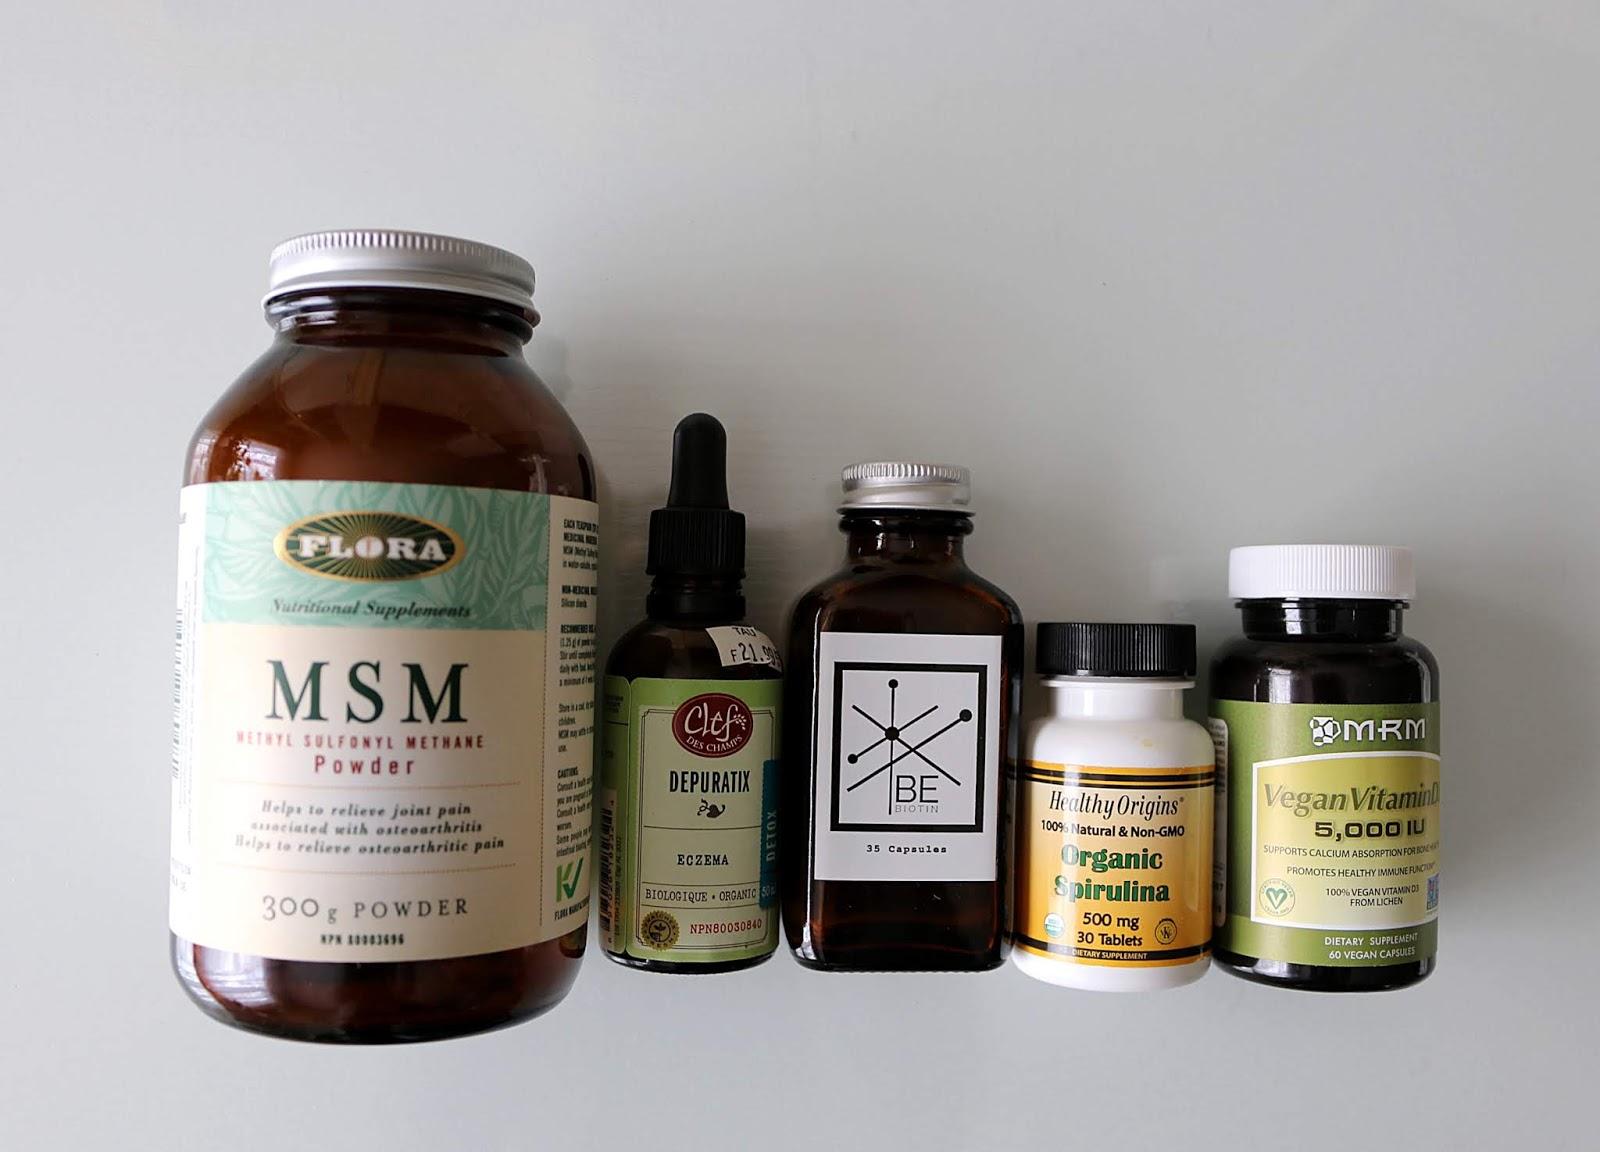 vegan supplements empties flora be biotin healthy origins clef des champs mrm